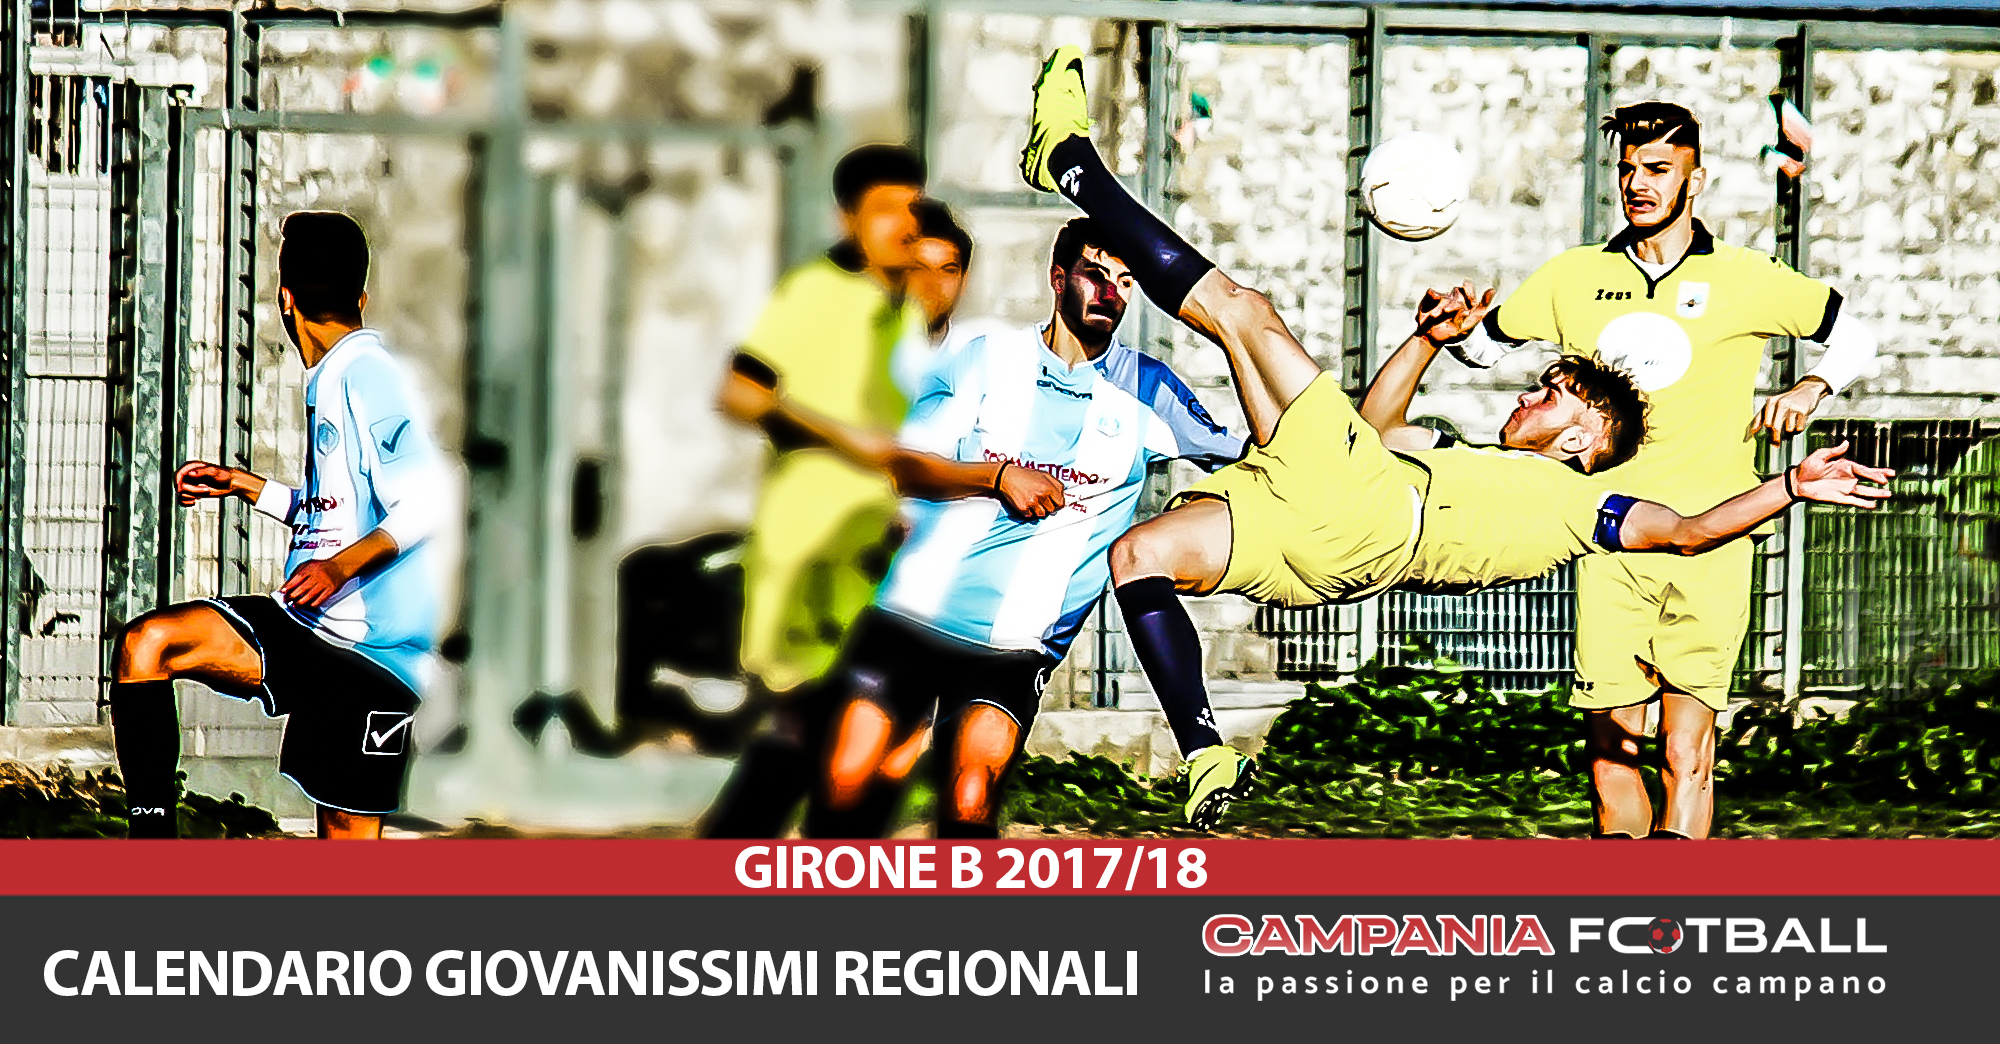 Calendario Giovanissimi Regionali.Campionato Giovanissimi Regionale Girone B Calendario 2017